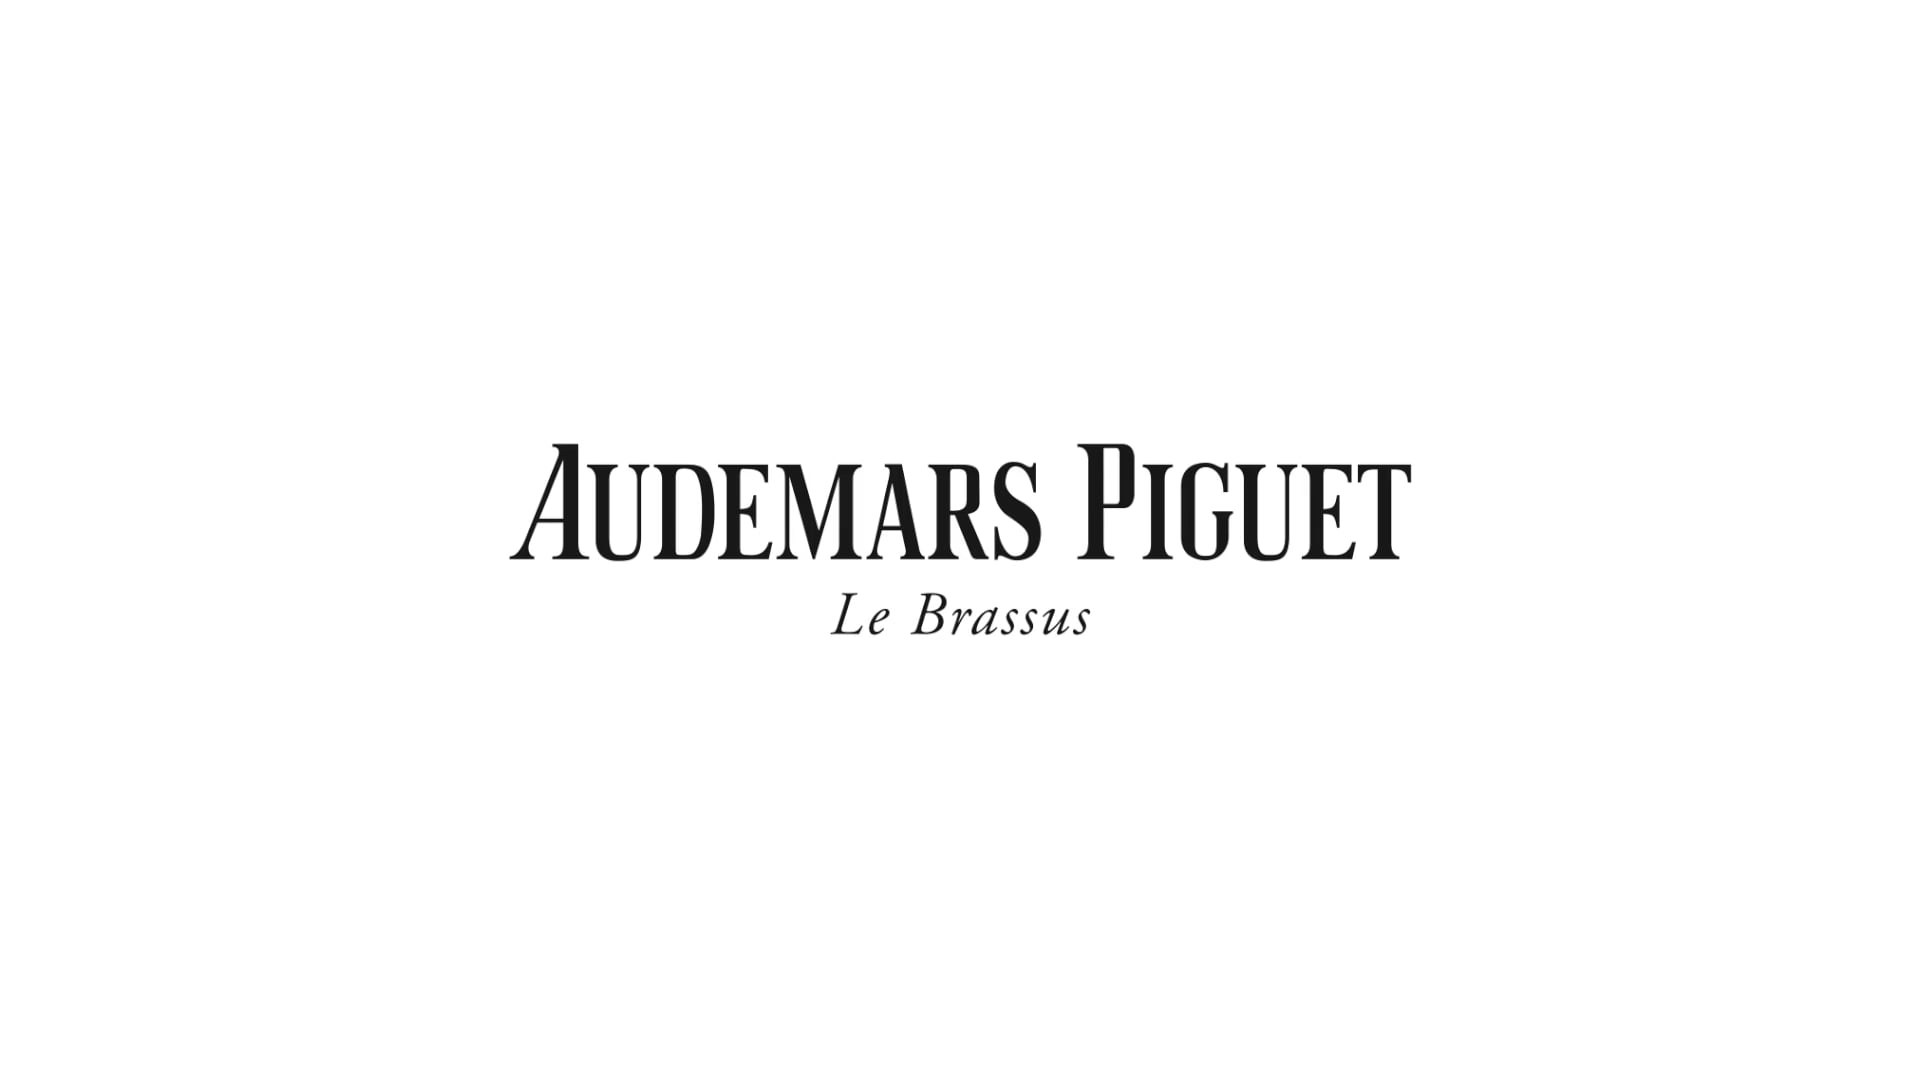 Audemars Piguet - Company Video [2017]